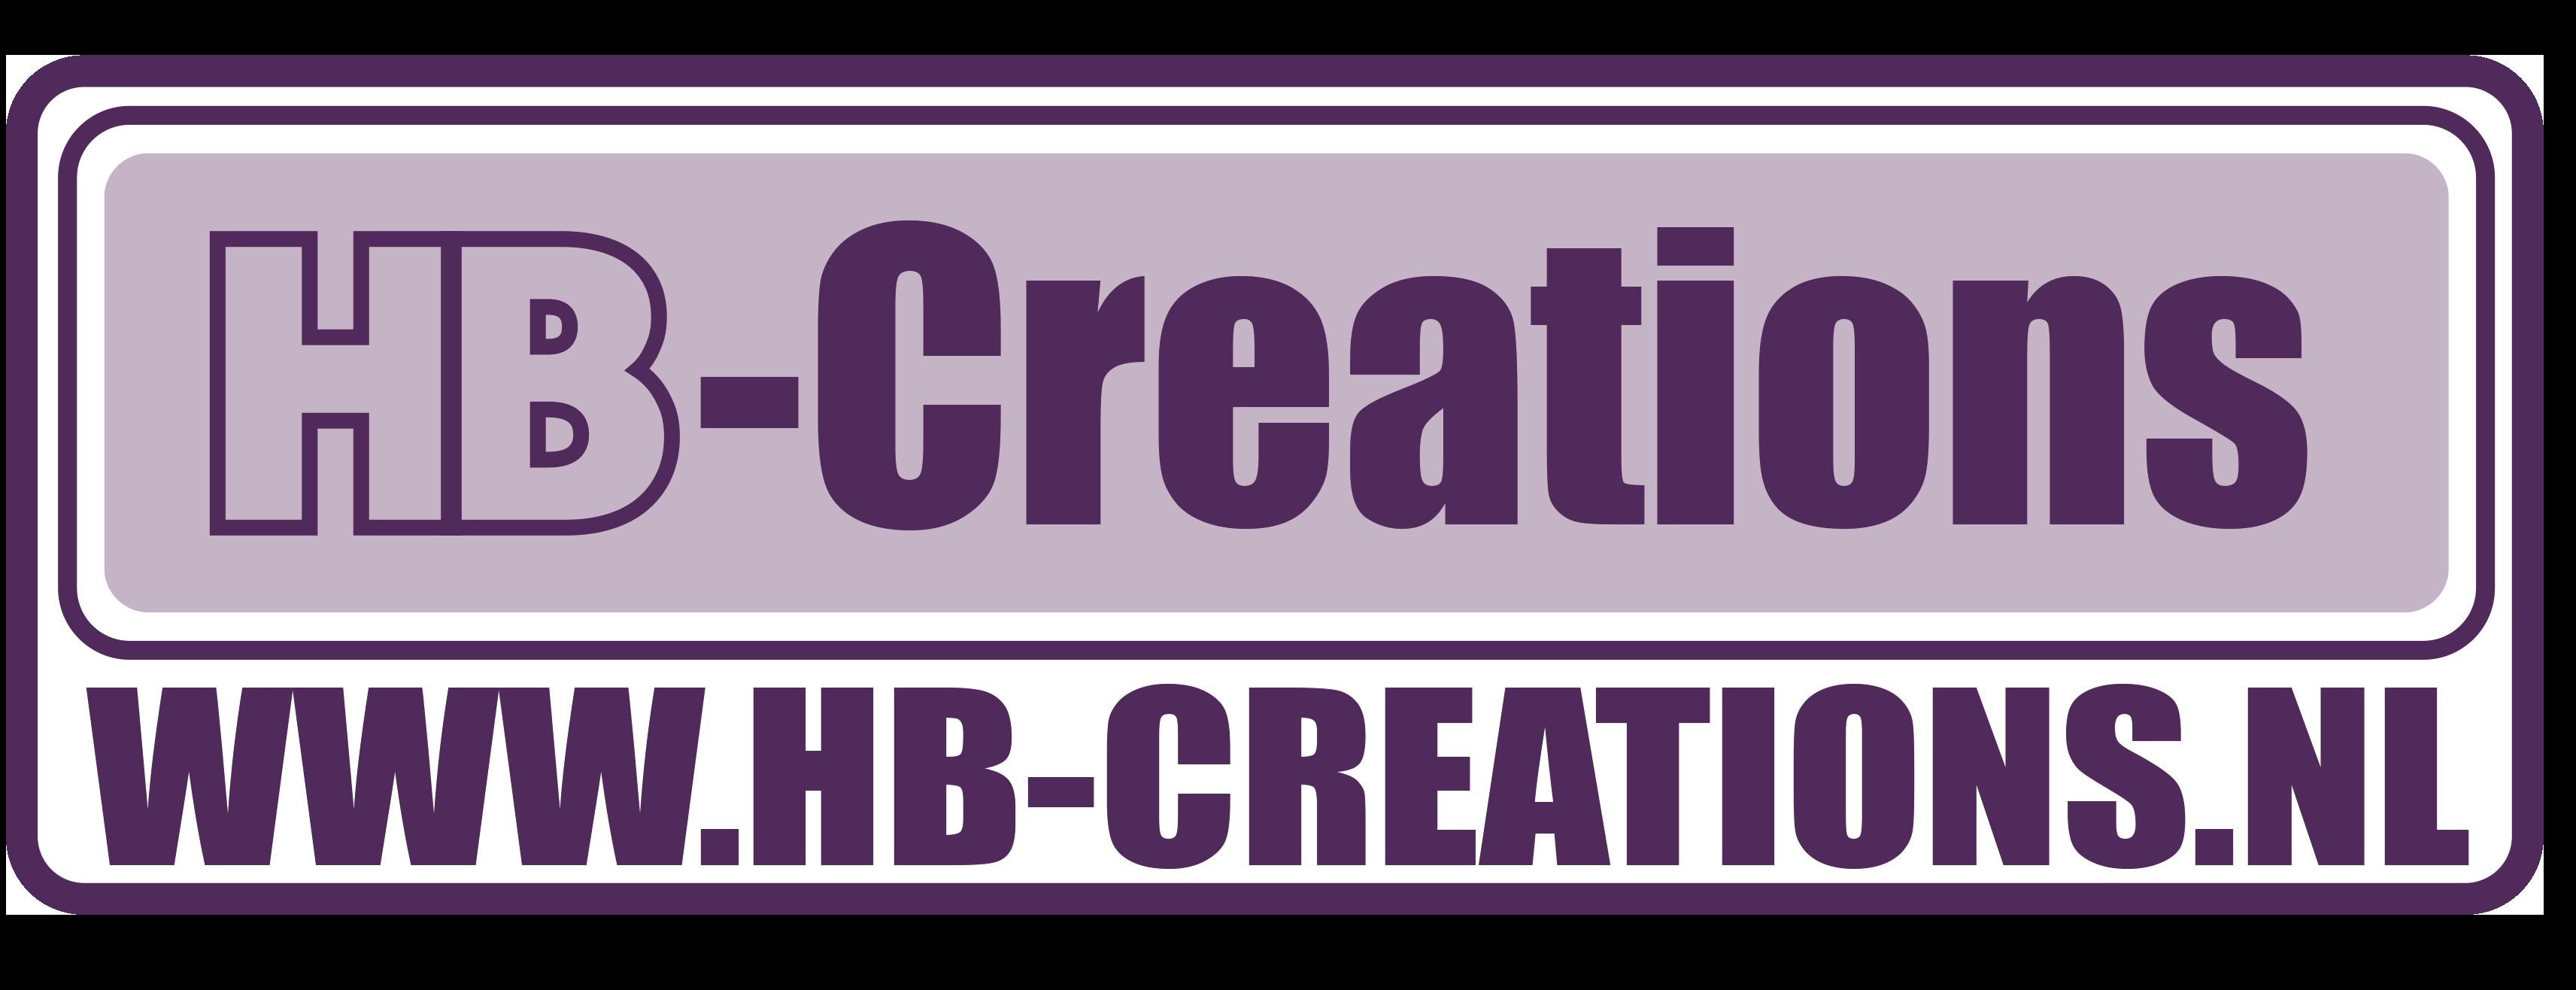 Webshop HB-Creations